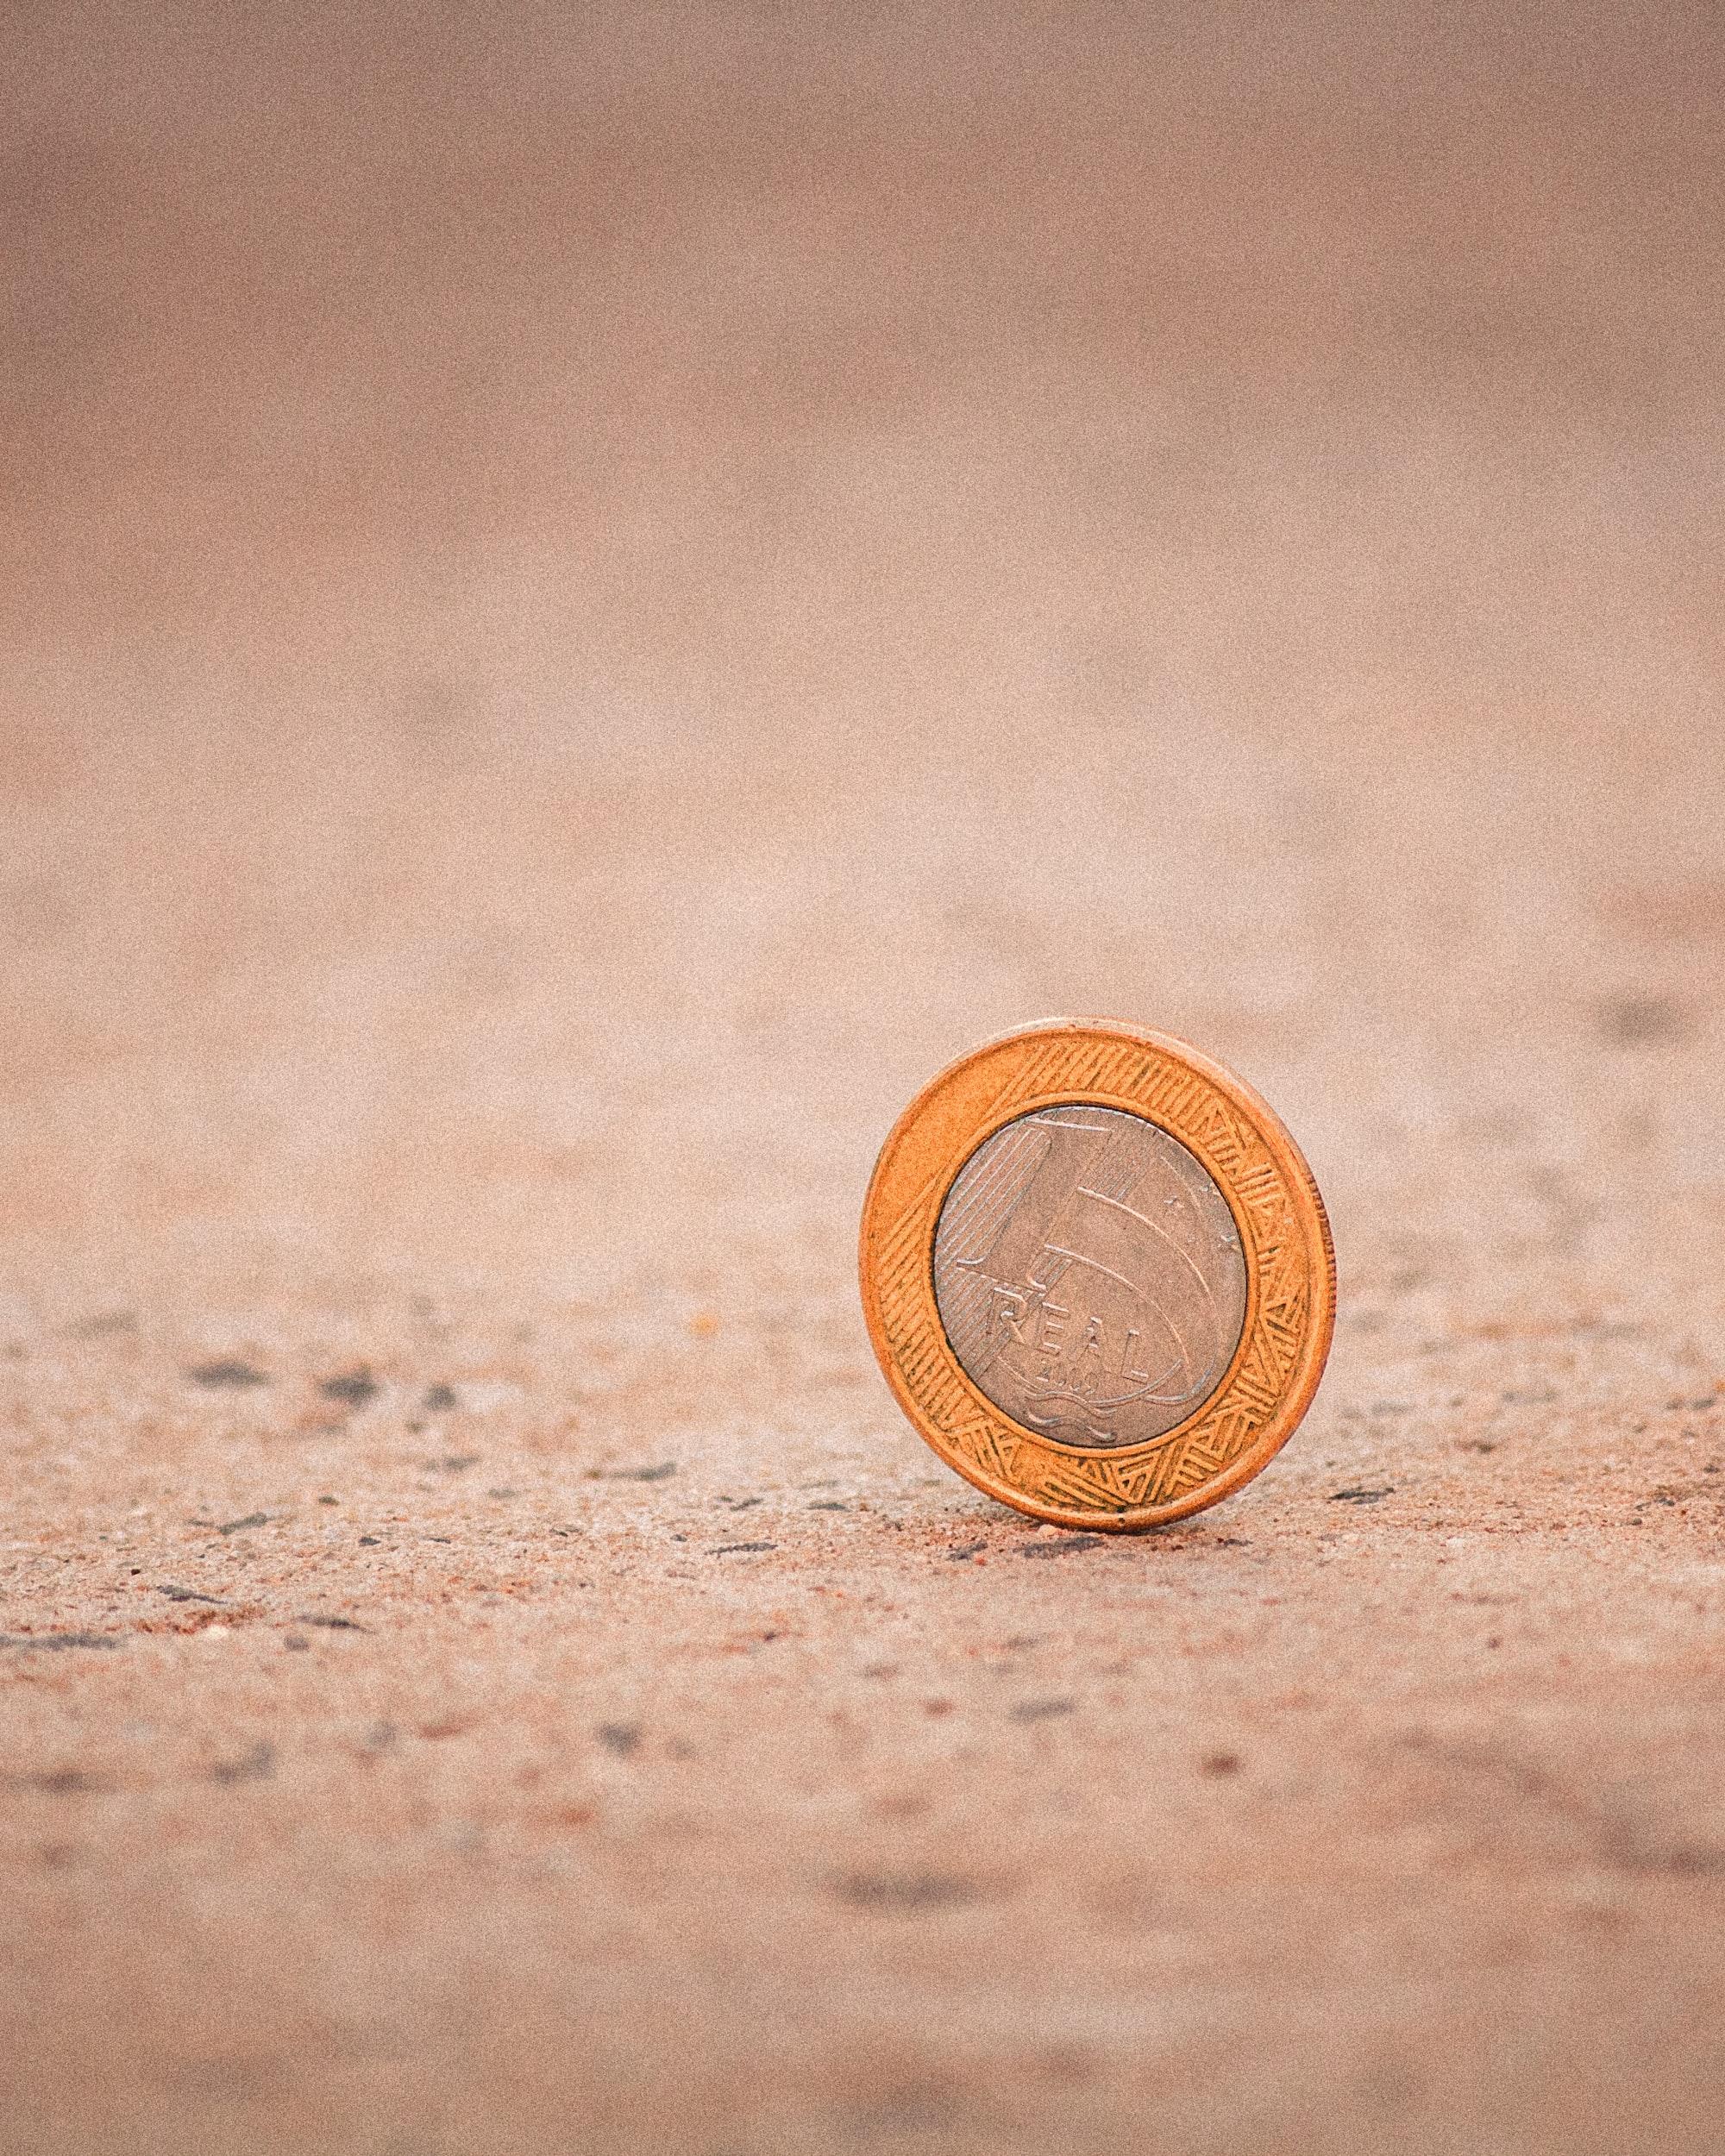 Parcelamento de Débitos de Pequeno Valor na Receita Federal.